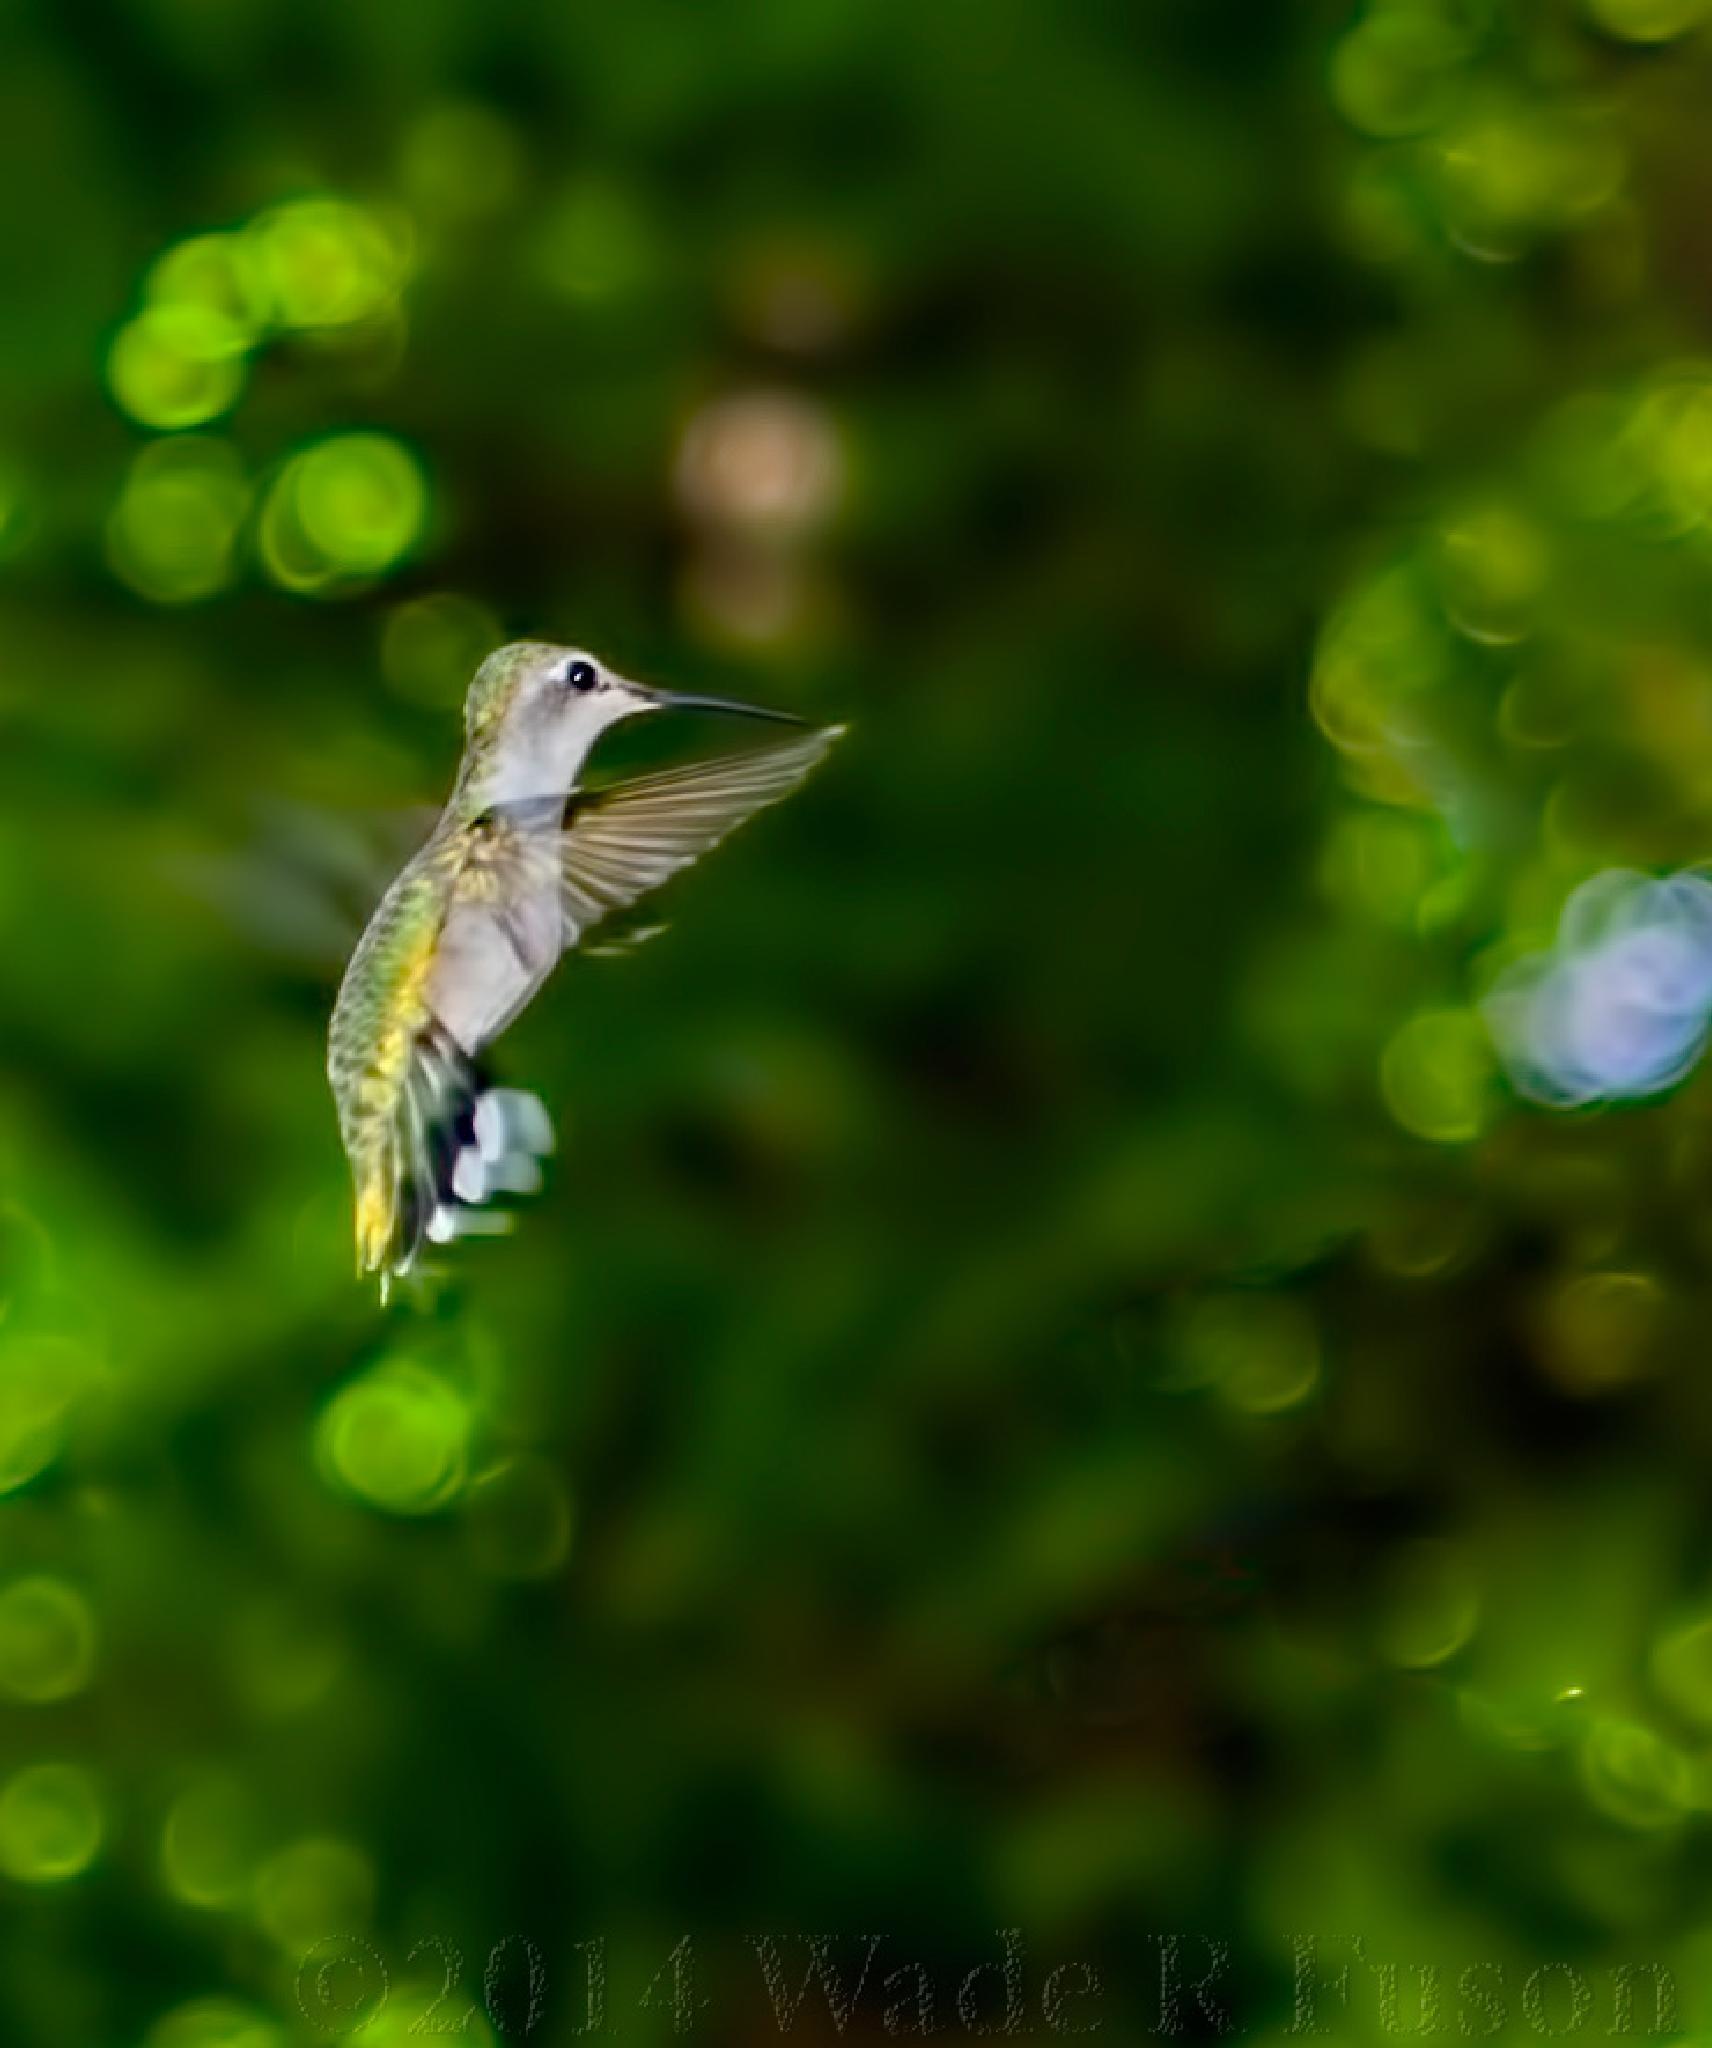 Hummingbird #1 by Wade Fuson